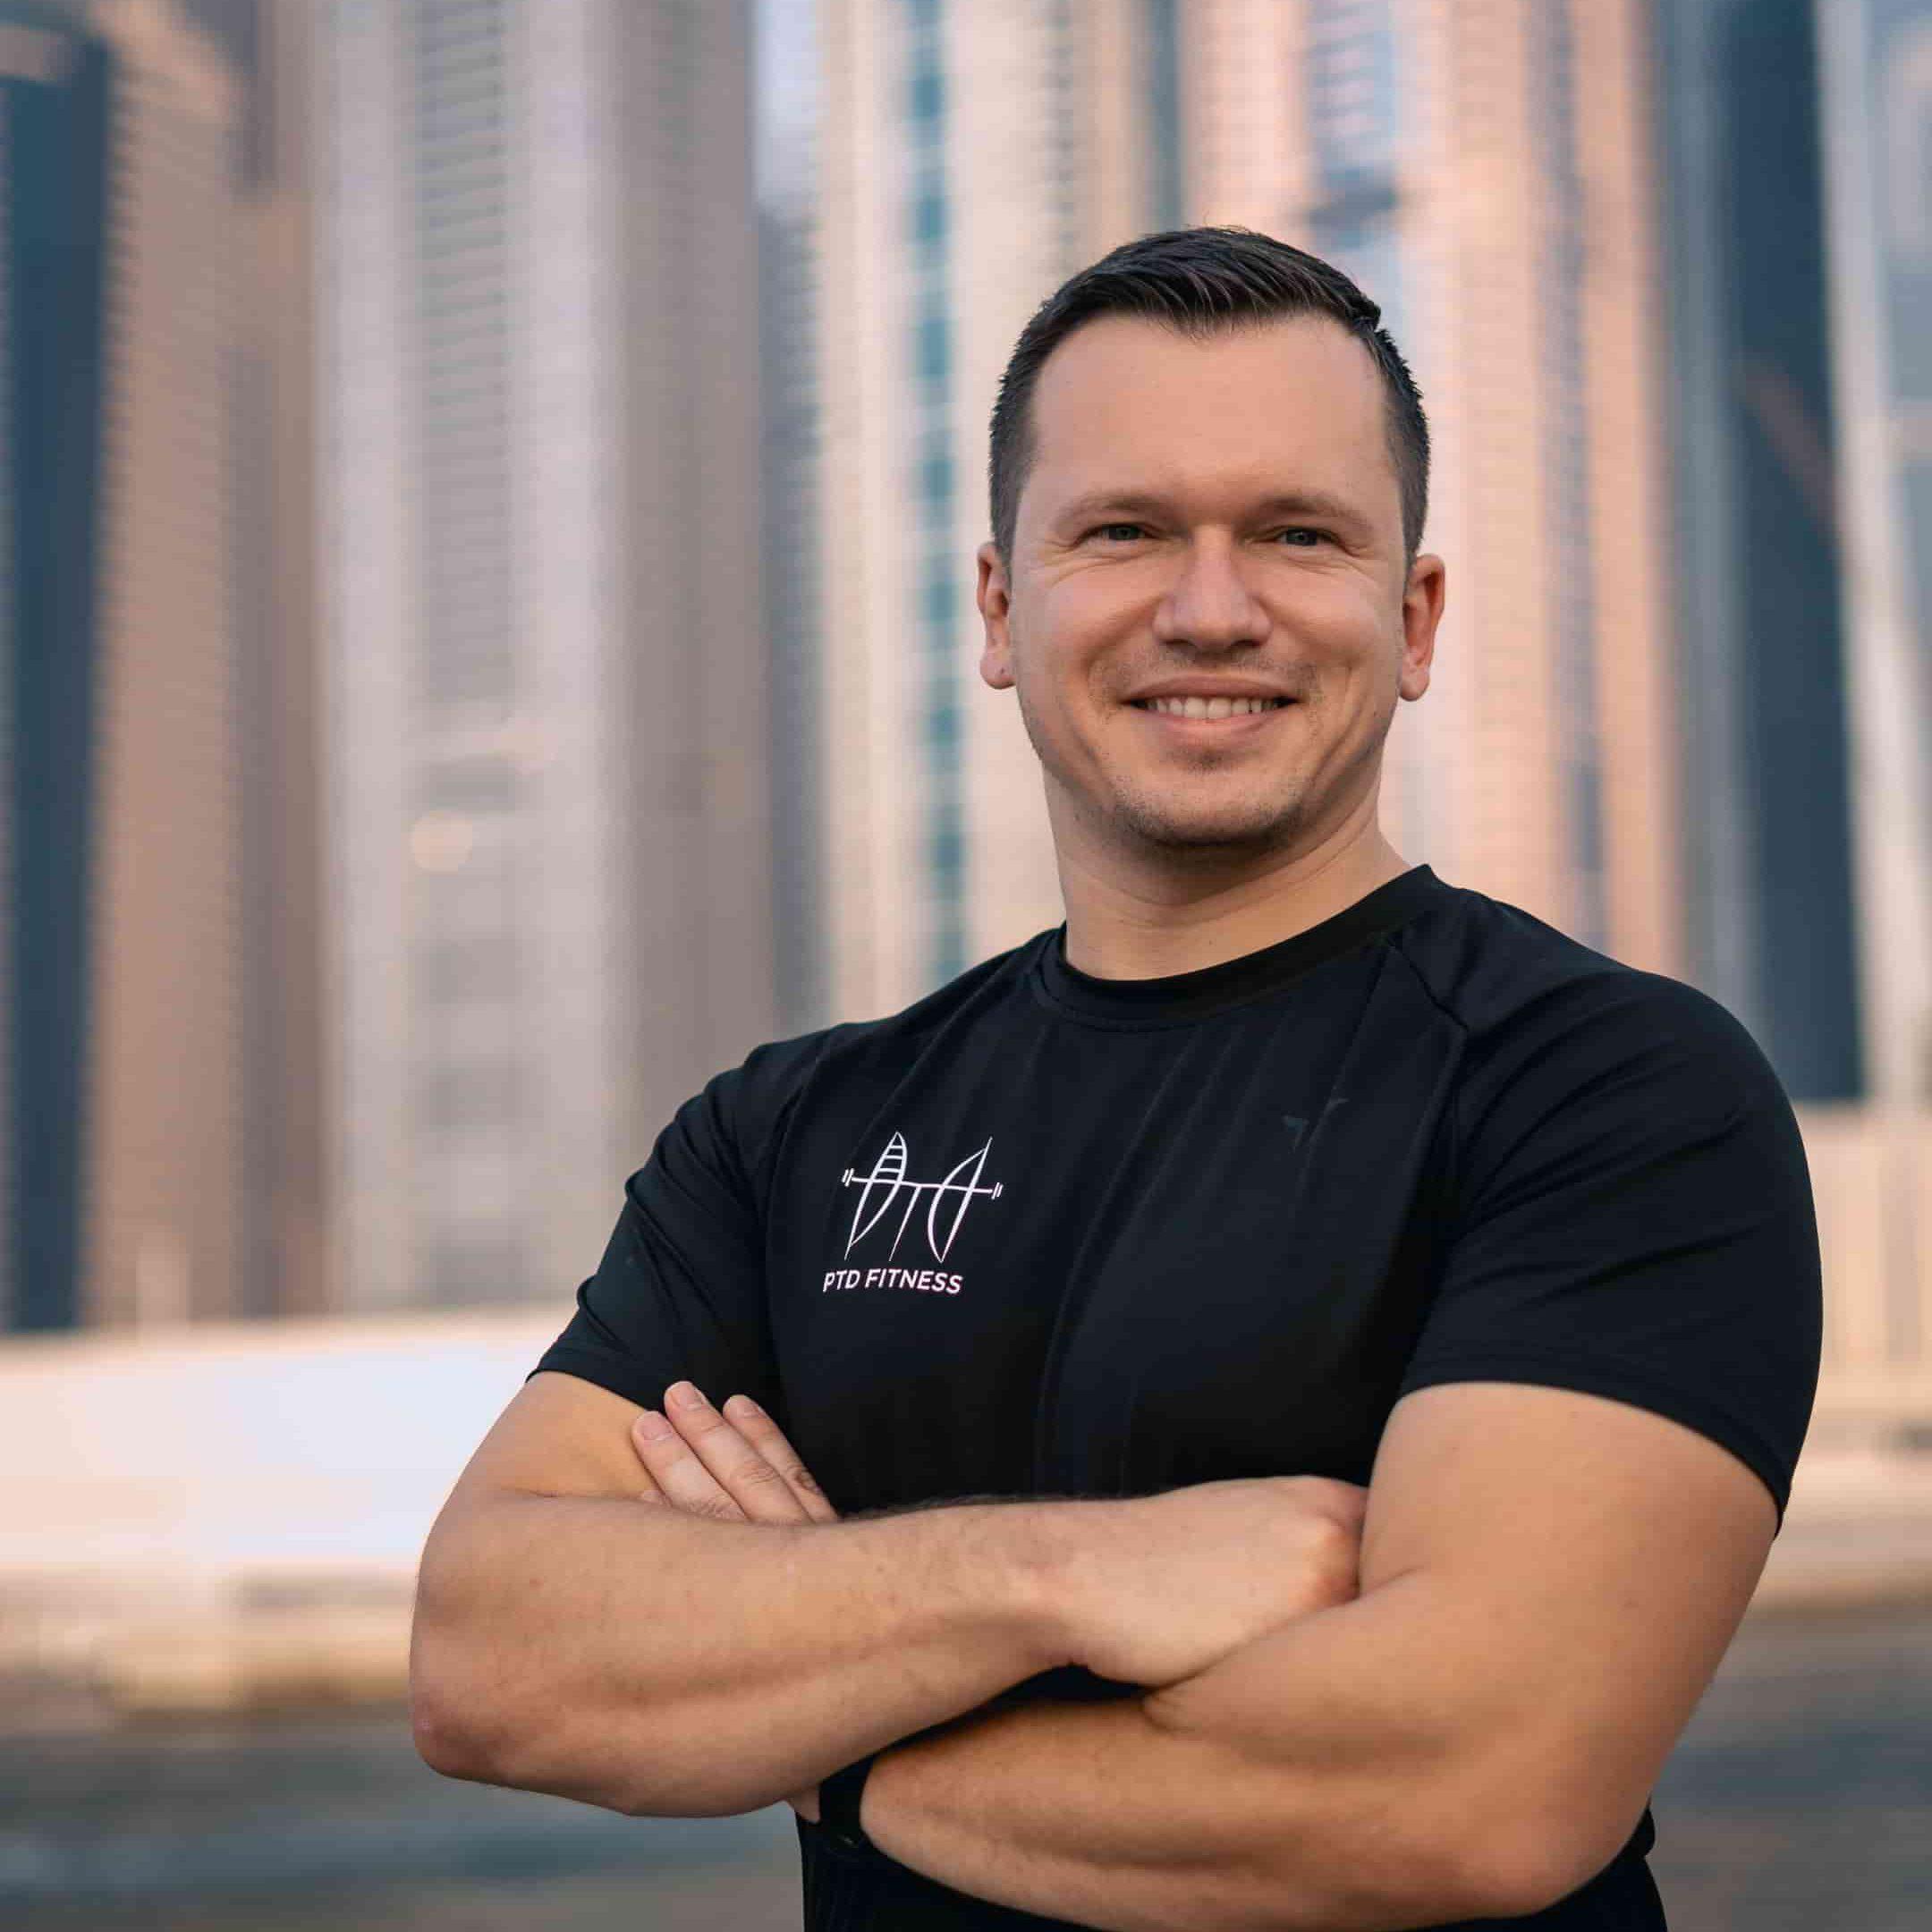 Personal Trainer Dubai Milan